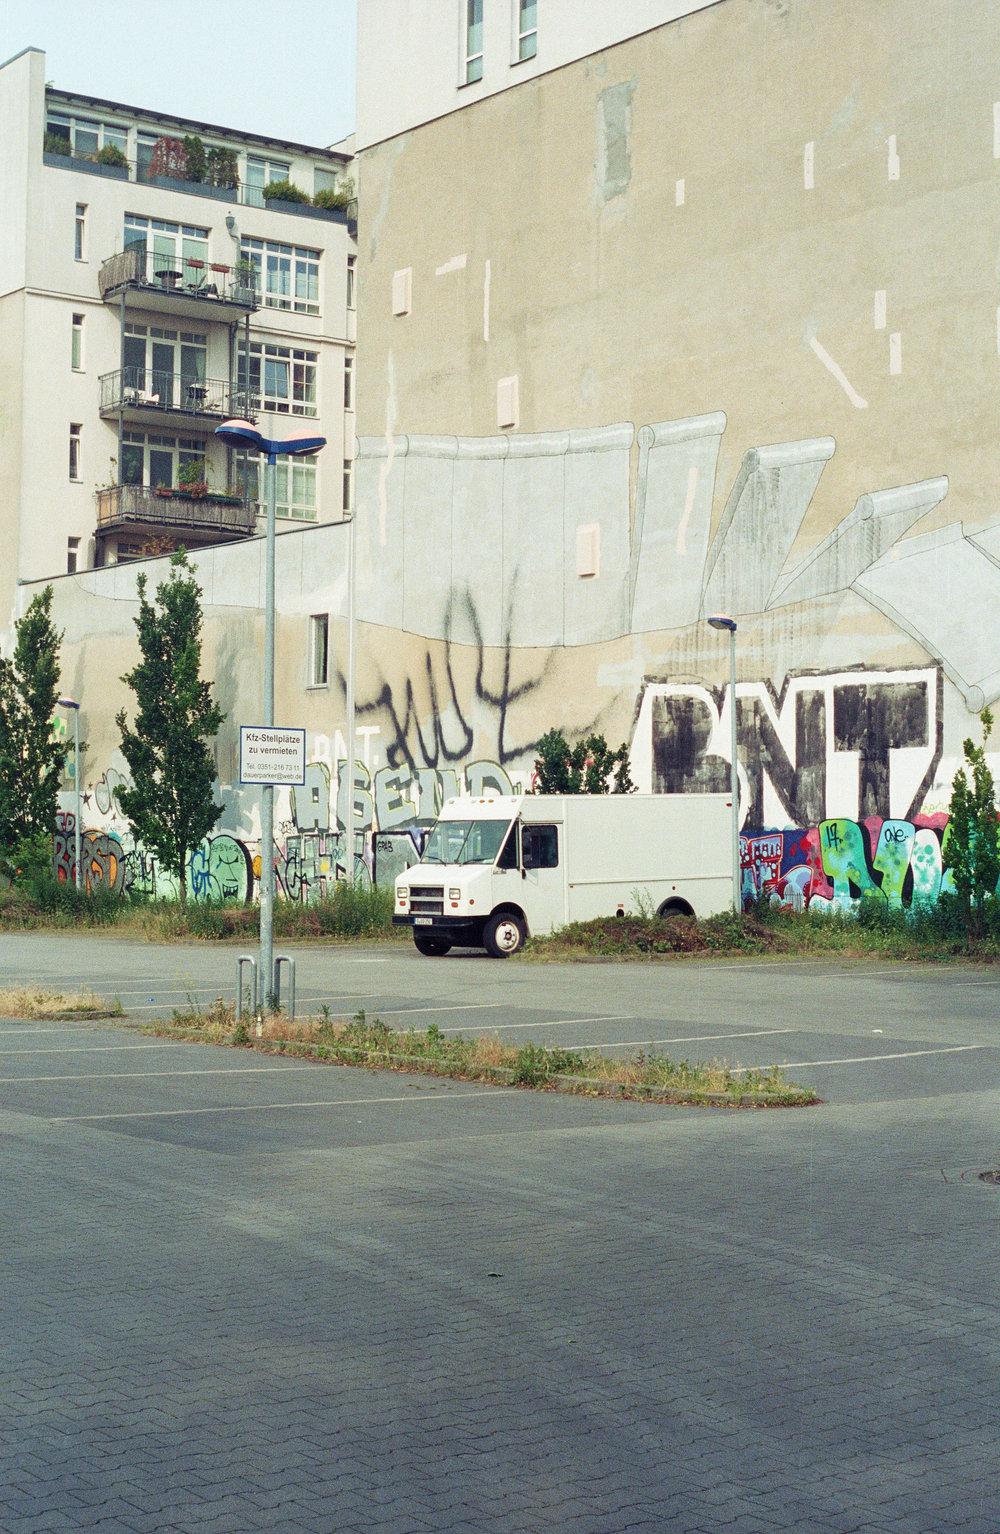 Berlin_72dpi-44.jpg